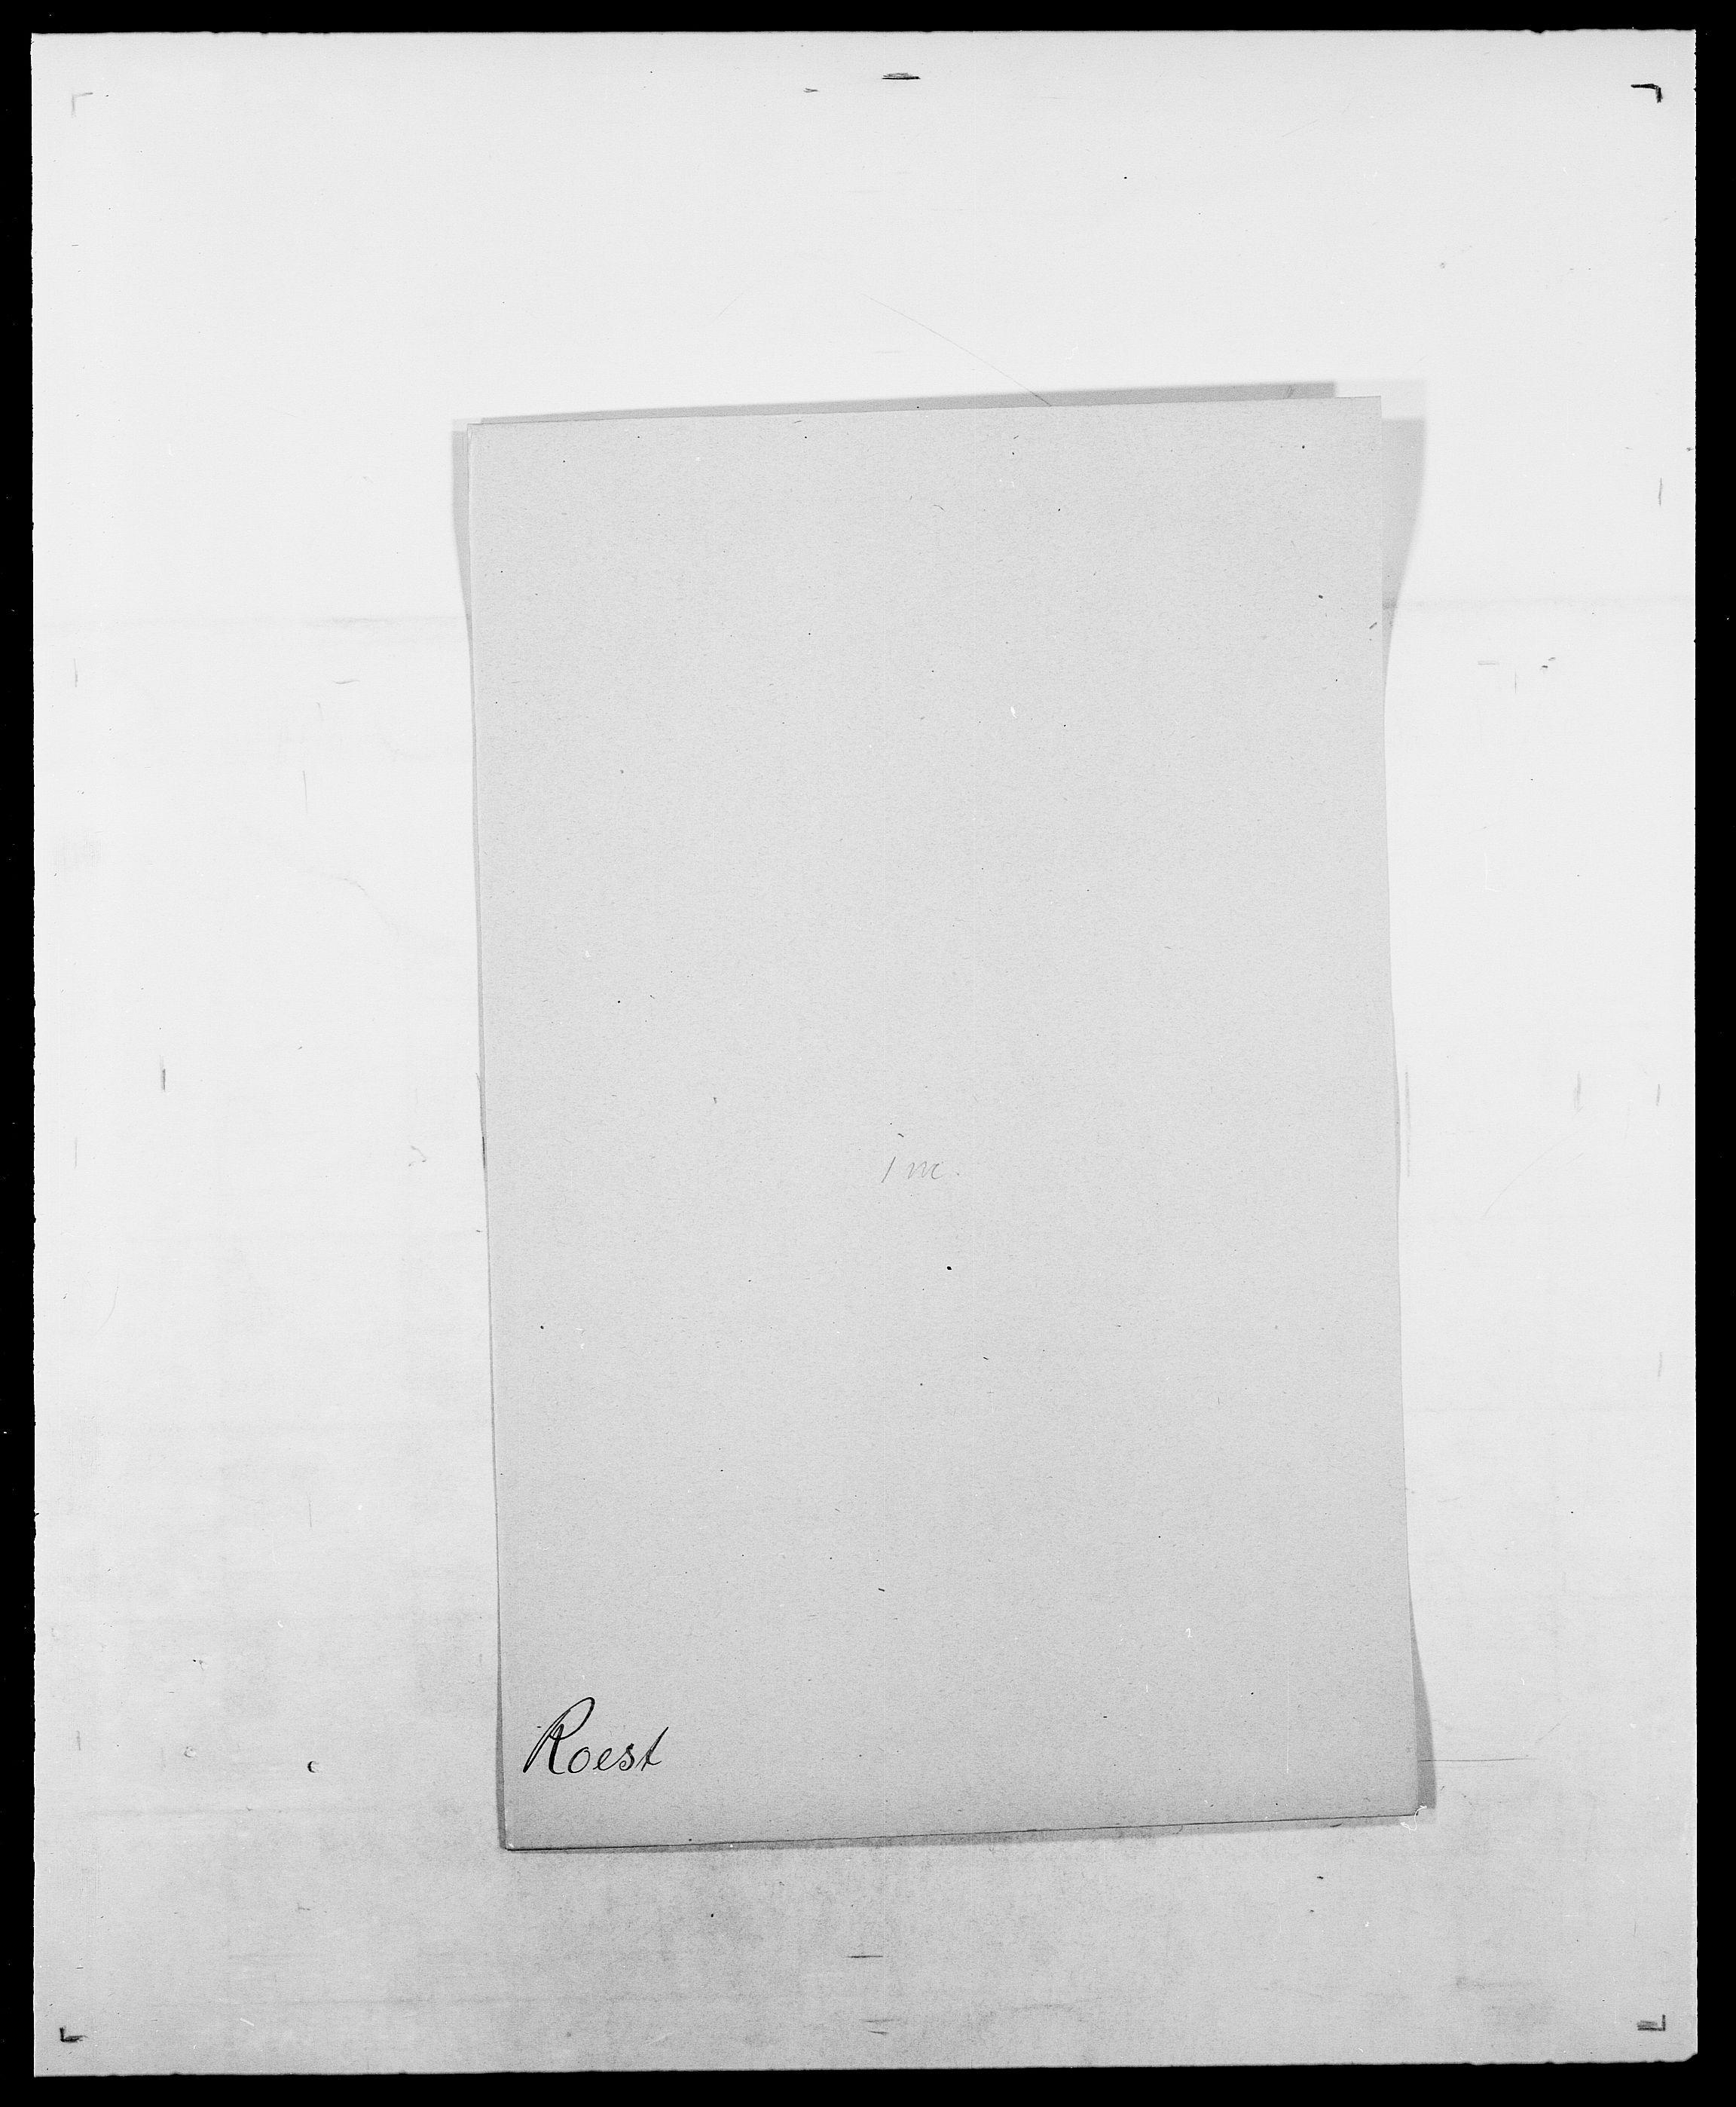 SAO, Delgobe, Charles Antoine - samling, D/Da/L0033: Roald - Røyem, s. 70